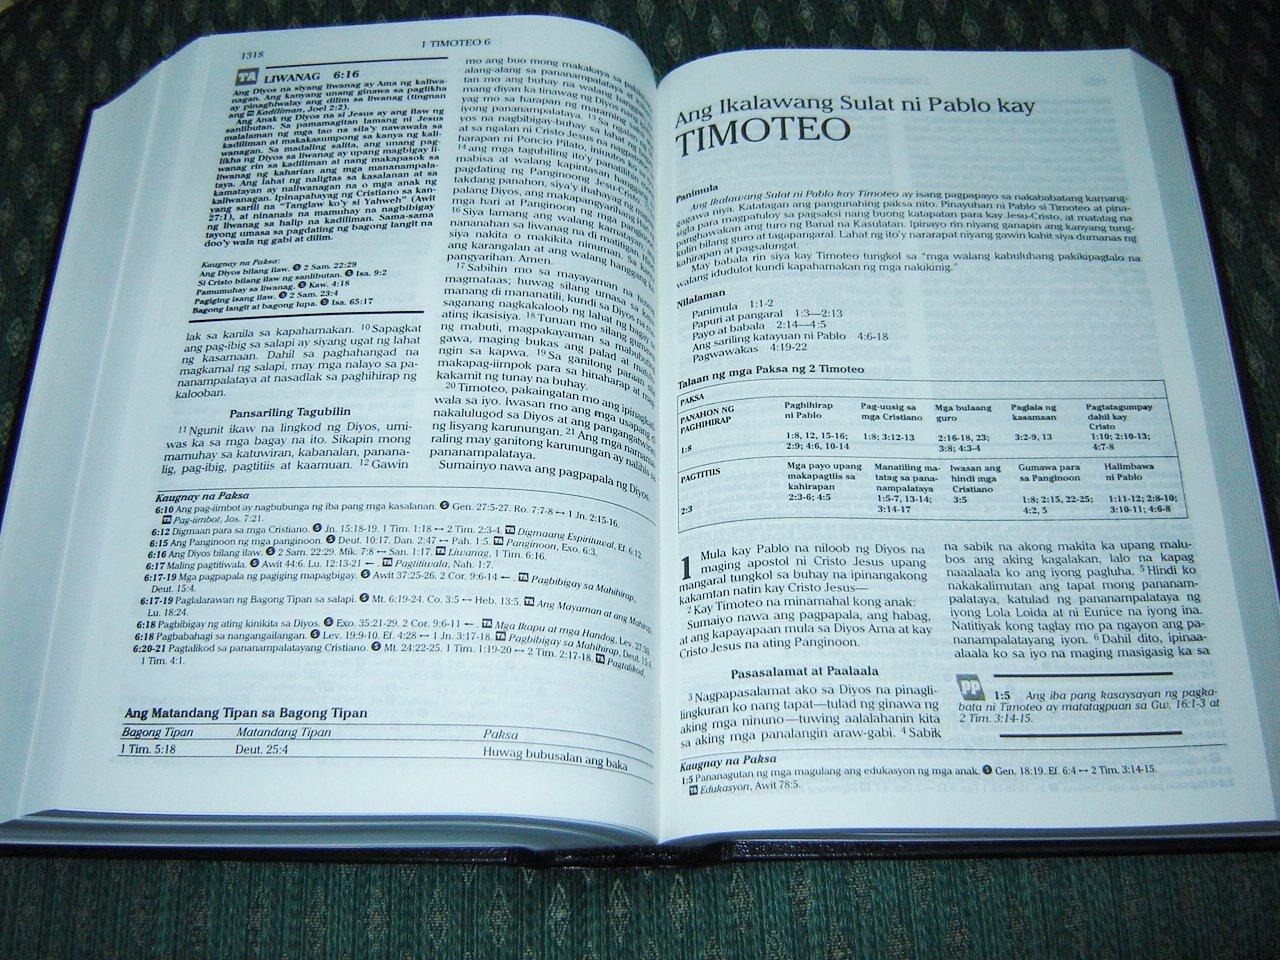 Tagalog Topical Study Bible / Tagalog Popular Version